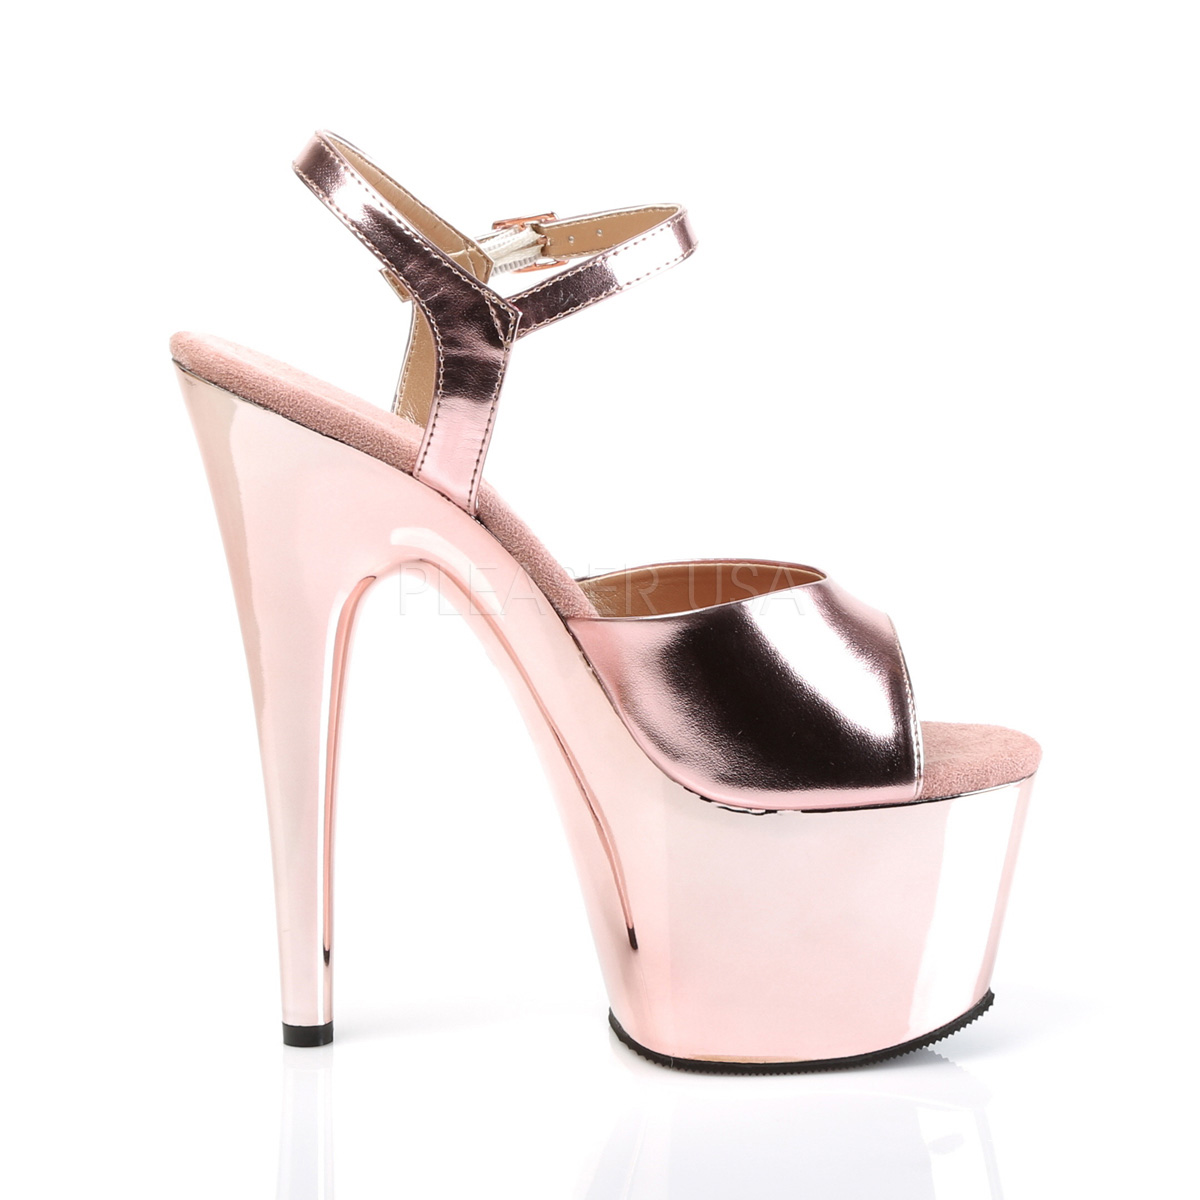 ed31d0c4e67 ... Platform High Heels ADORE-709 - Rose